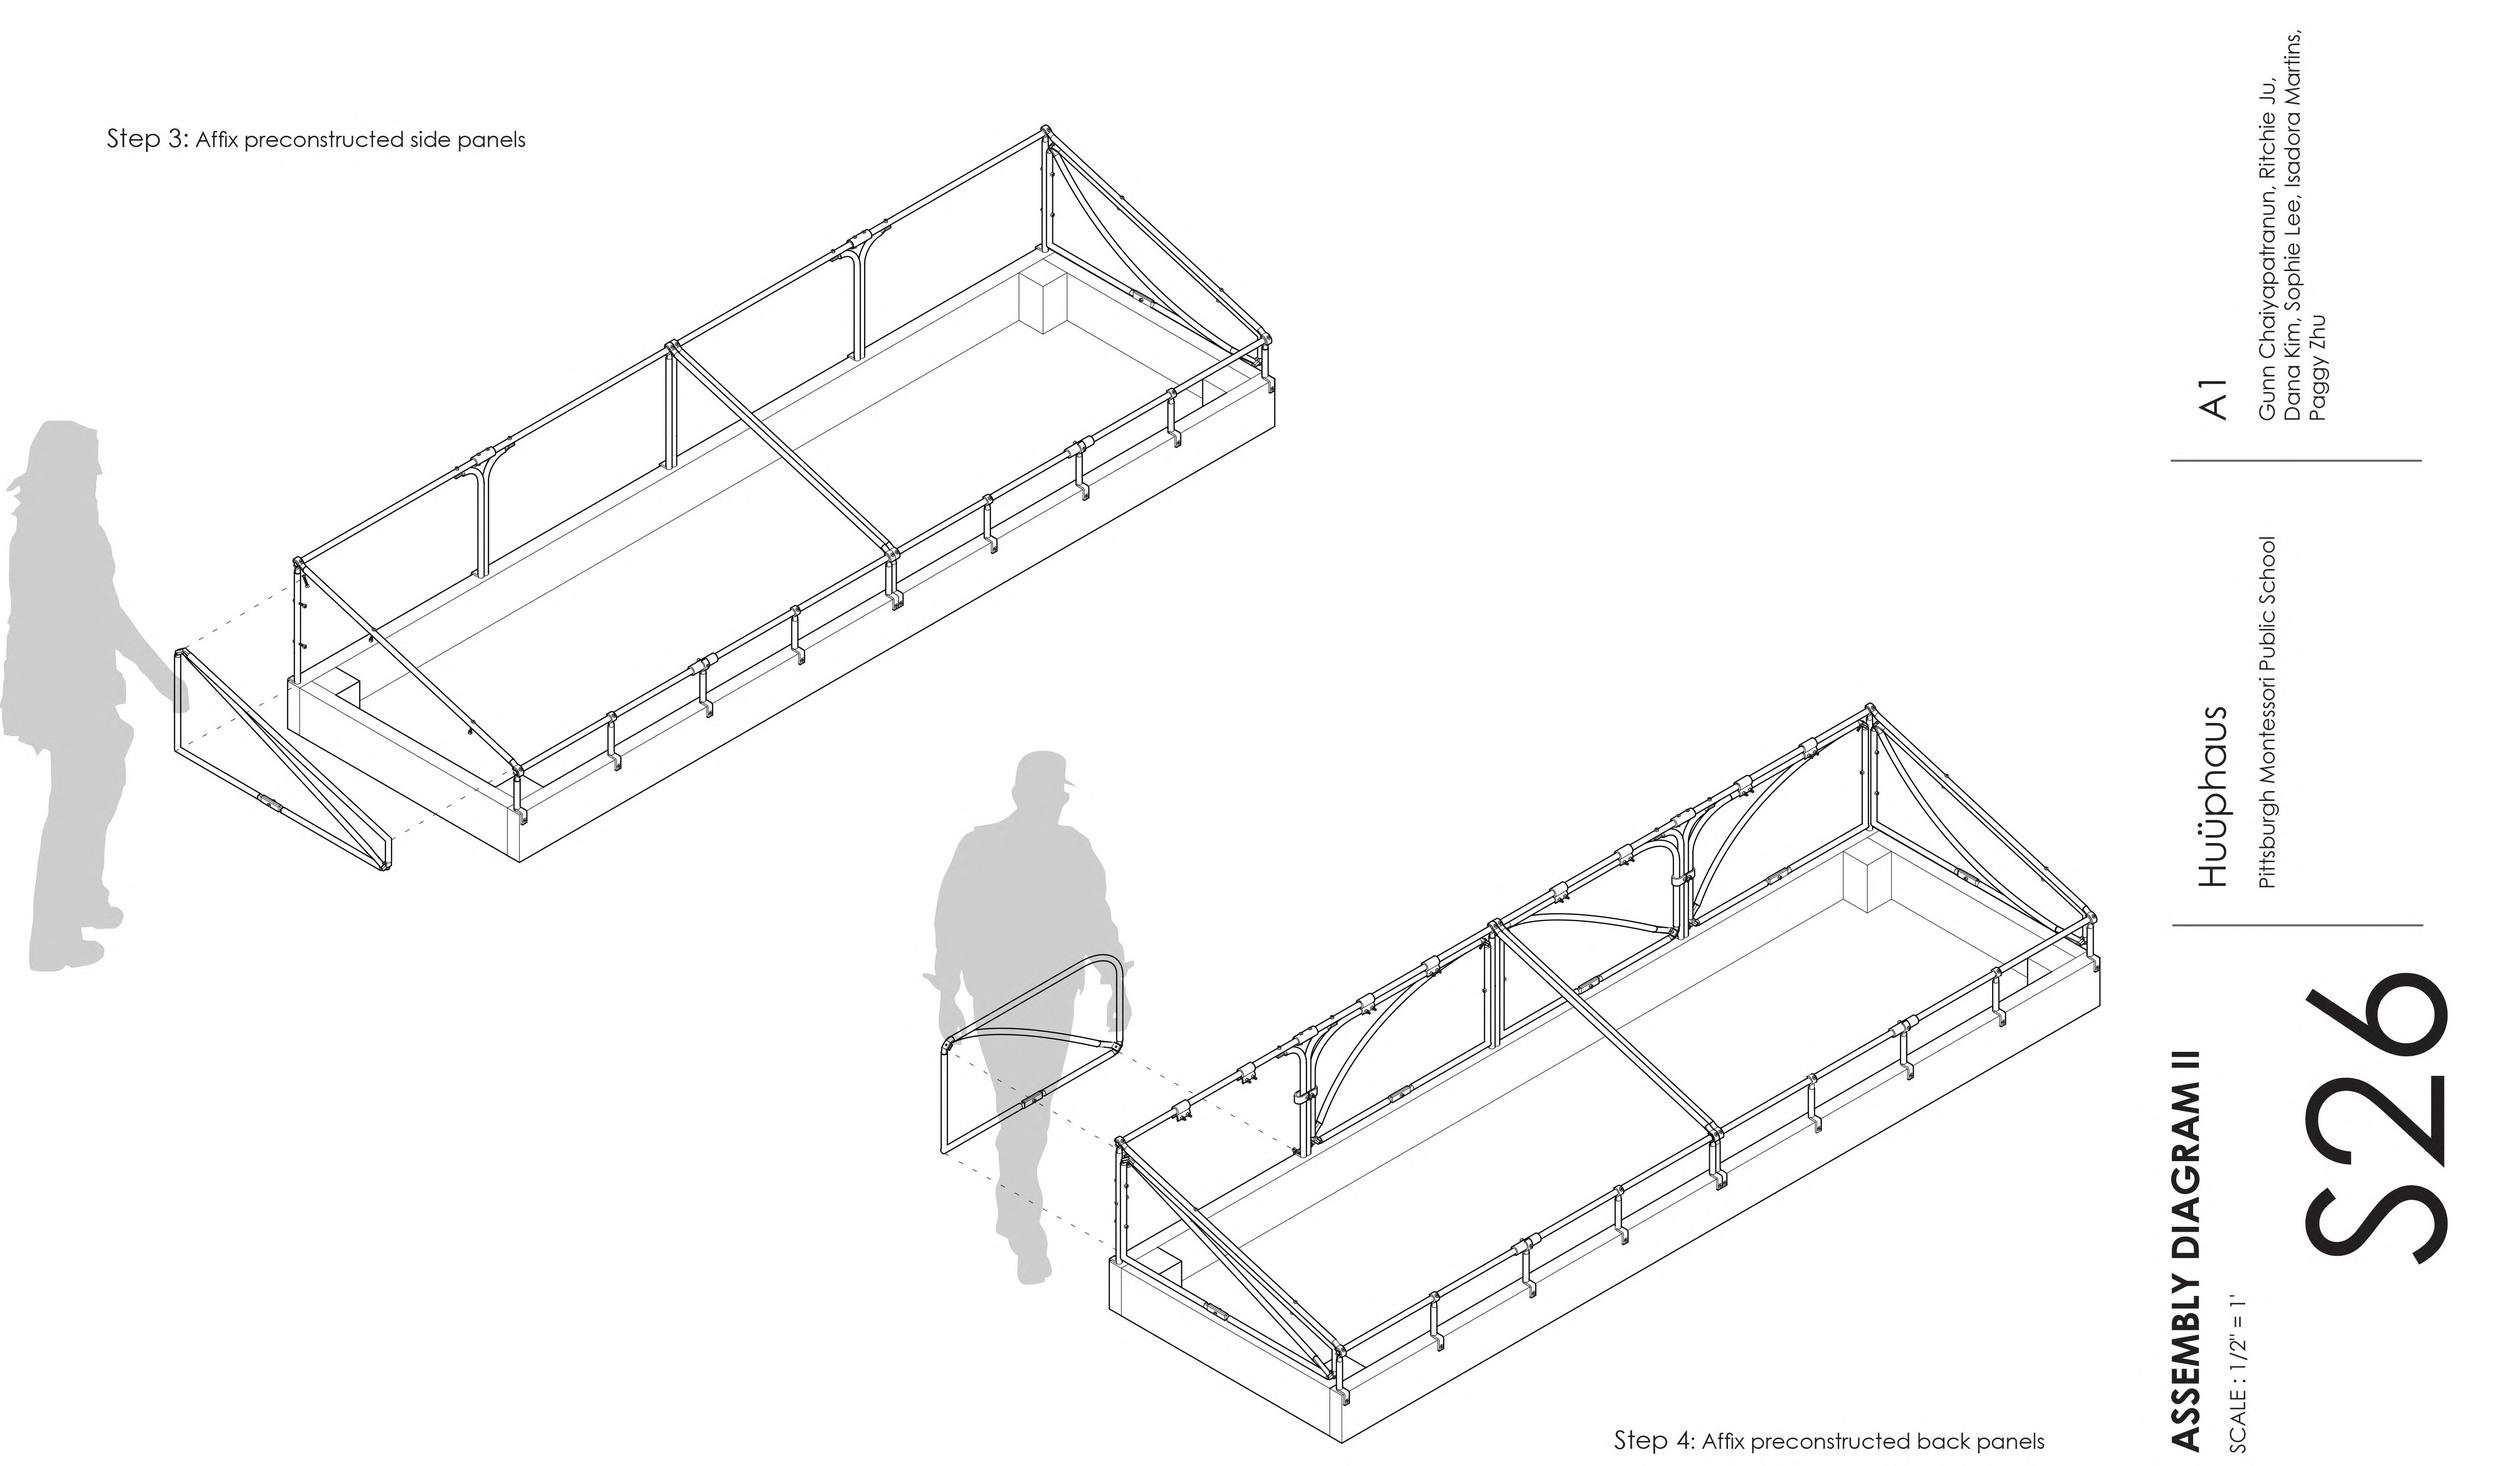 Arscott1-Drawing pack-26.jpg